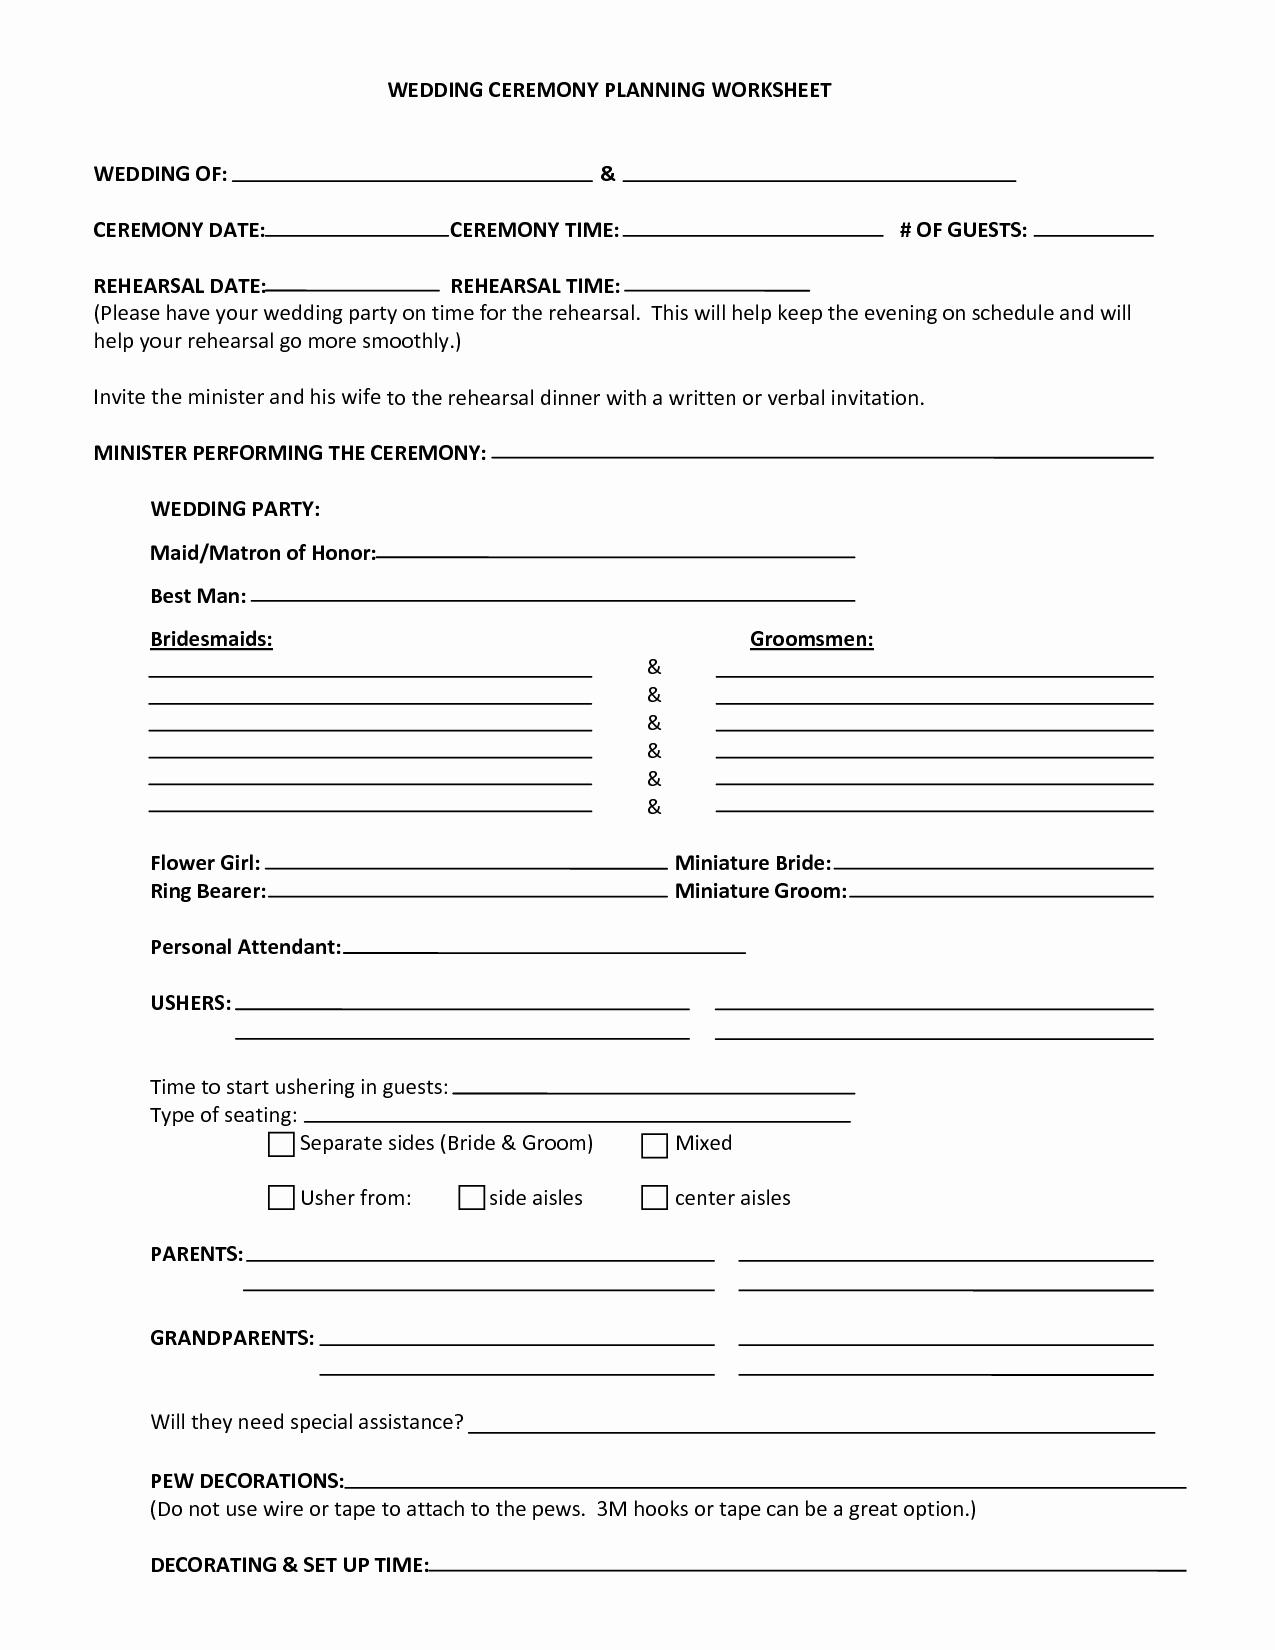 Worksheet Wedding Worksheet Hunterhq Free Printables